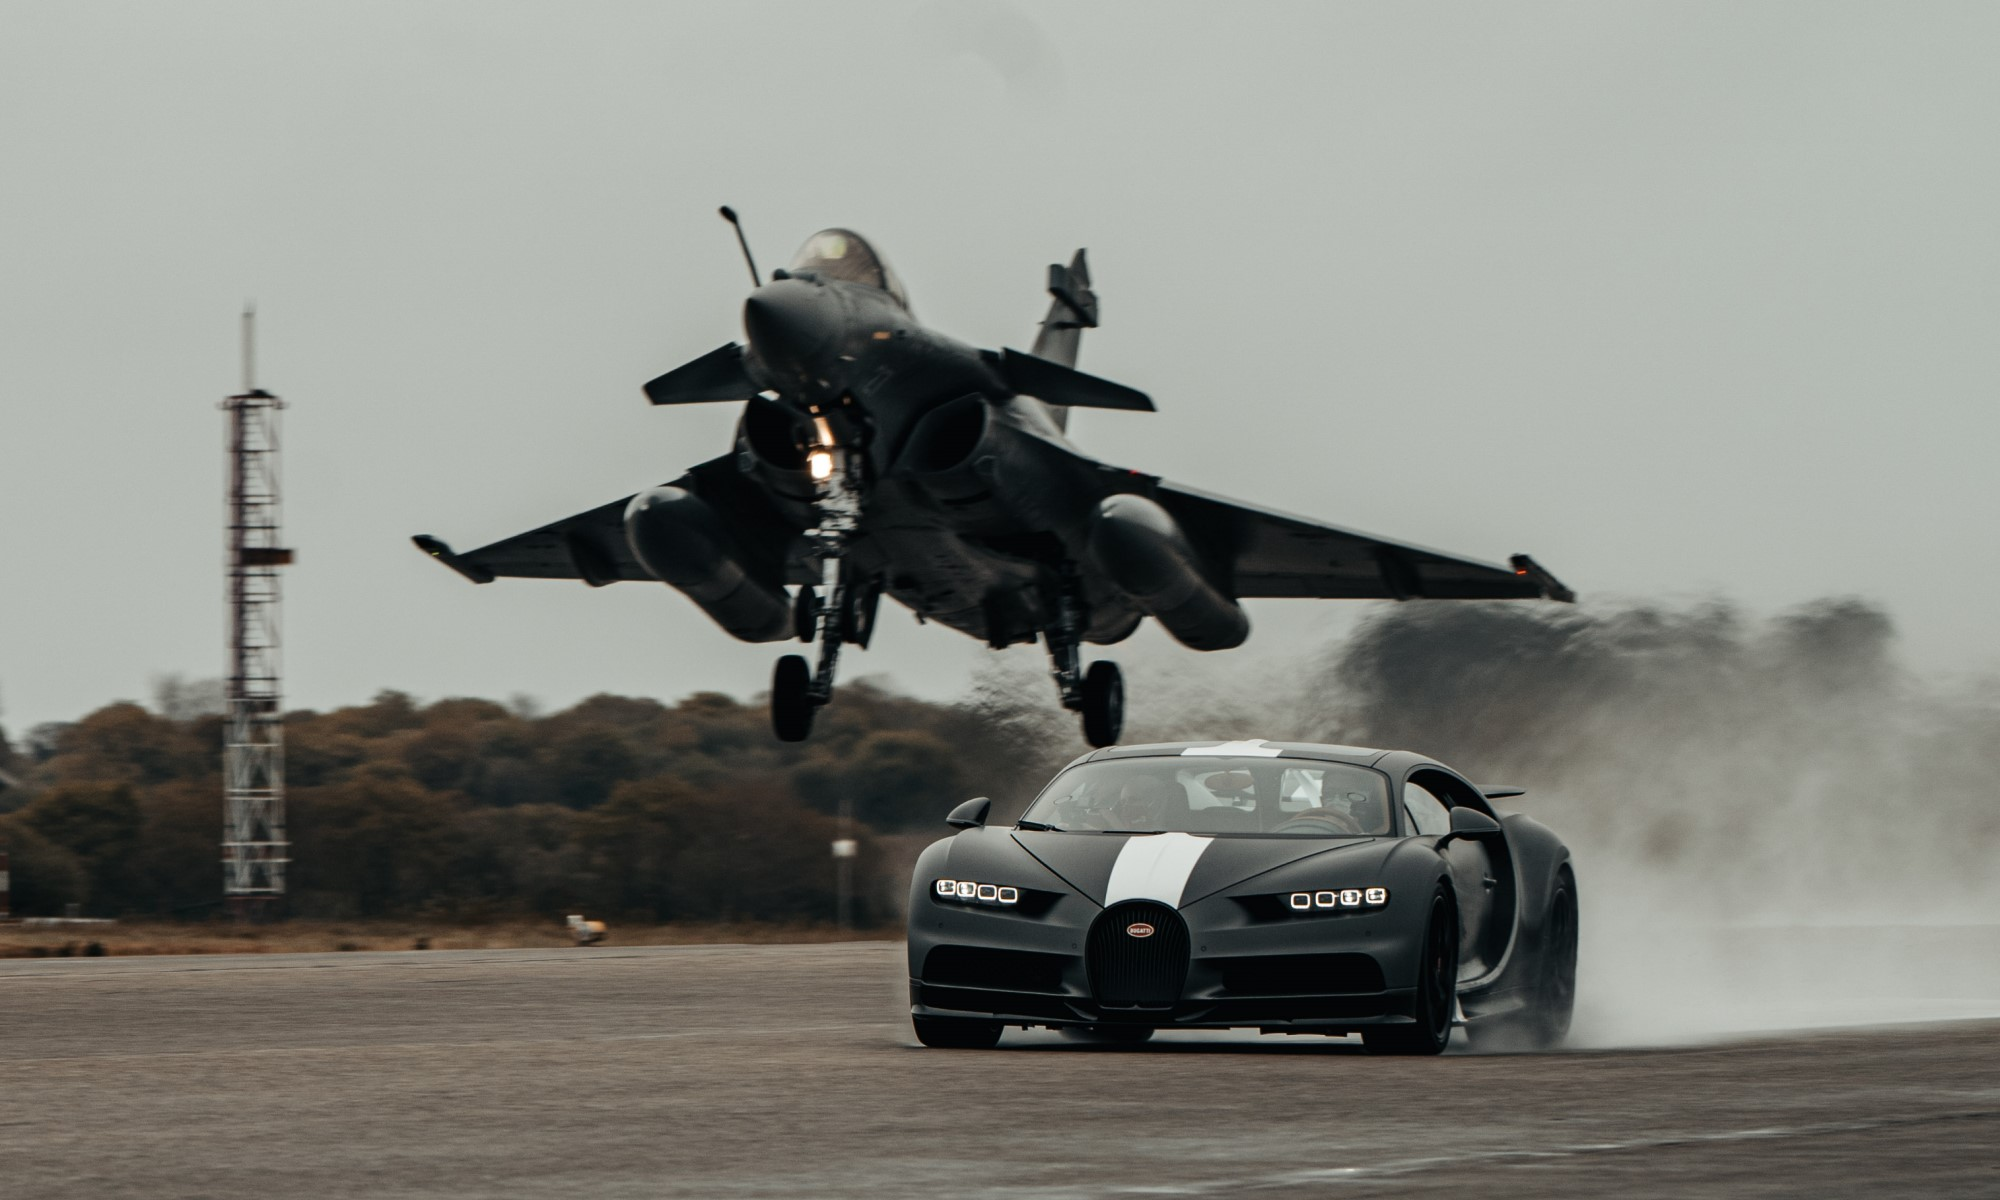 Bugatti Chiron Races Fighter Jet take off